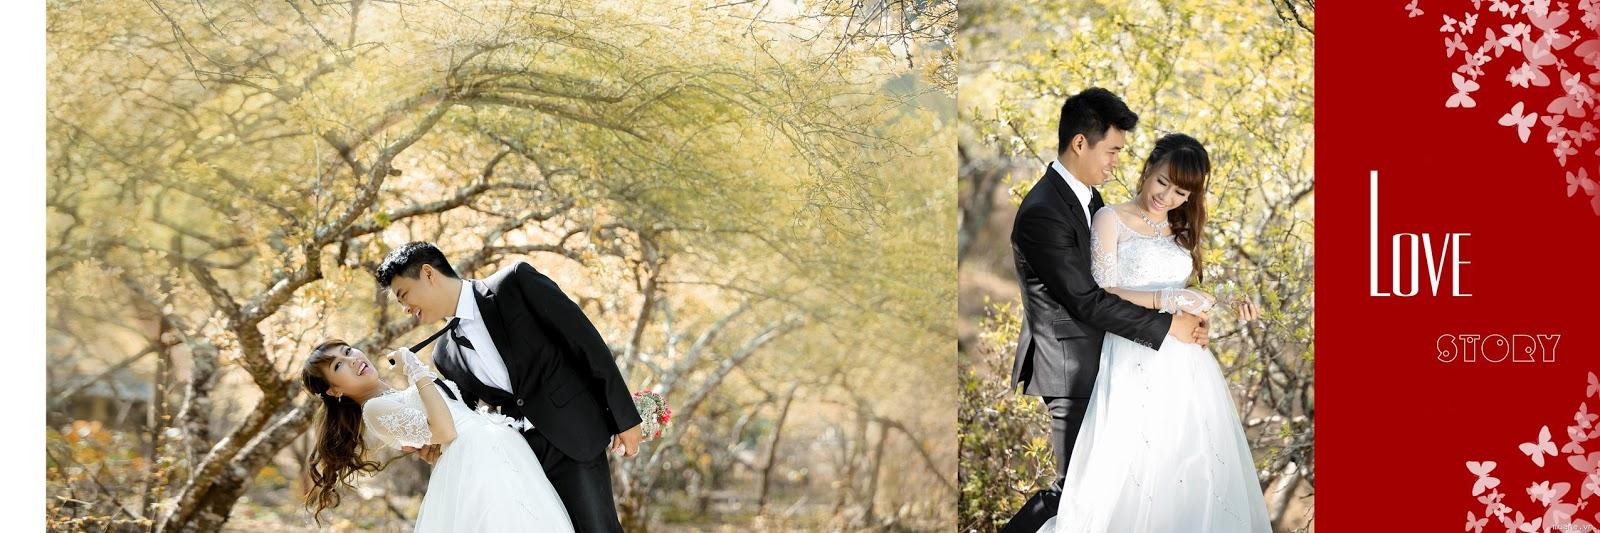 Học photoshop  ở tphcm học photoshop cấp tốc ở tphcm dạy photoshop ở  tphcm Dao-tao-photoshop-%25E1%25BA%25A3nh-c%25C6%25B0%25E1%25BB%259Bi